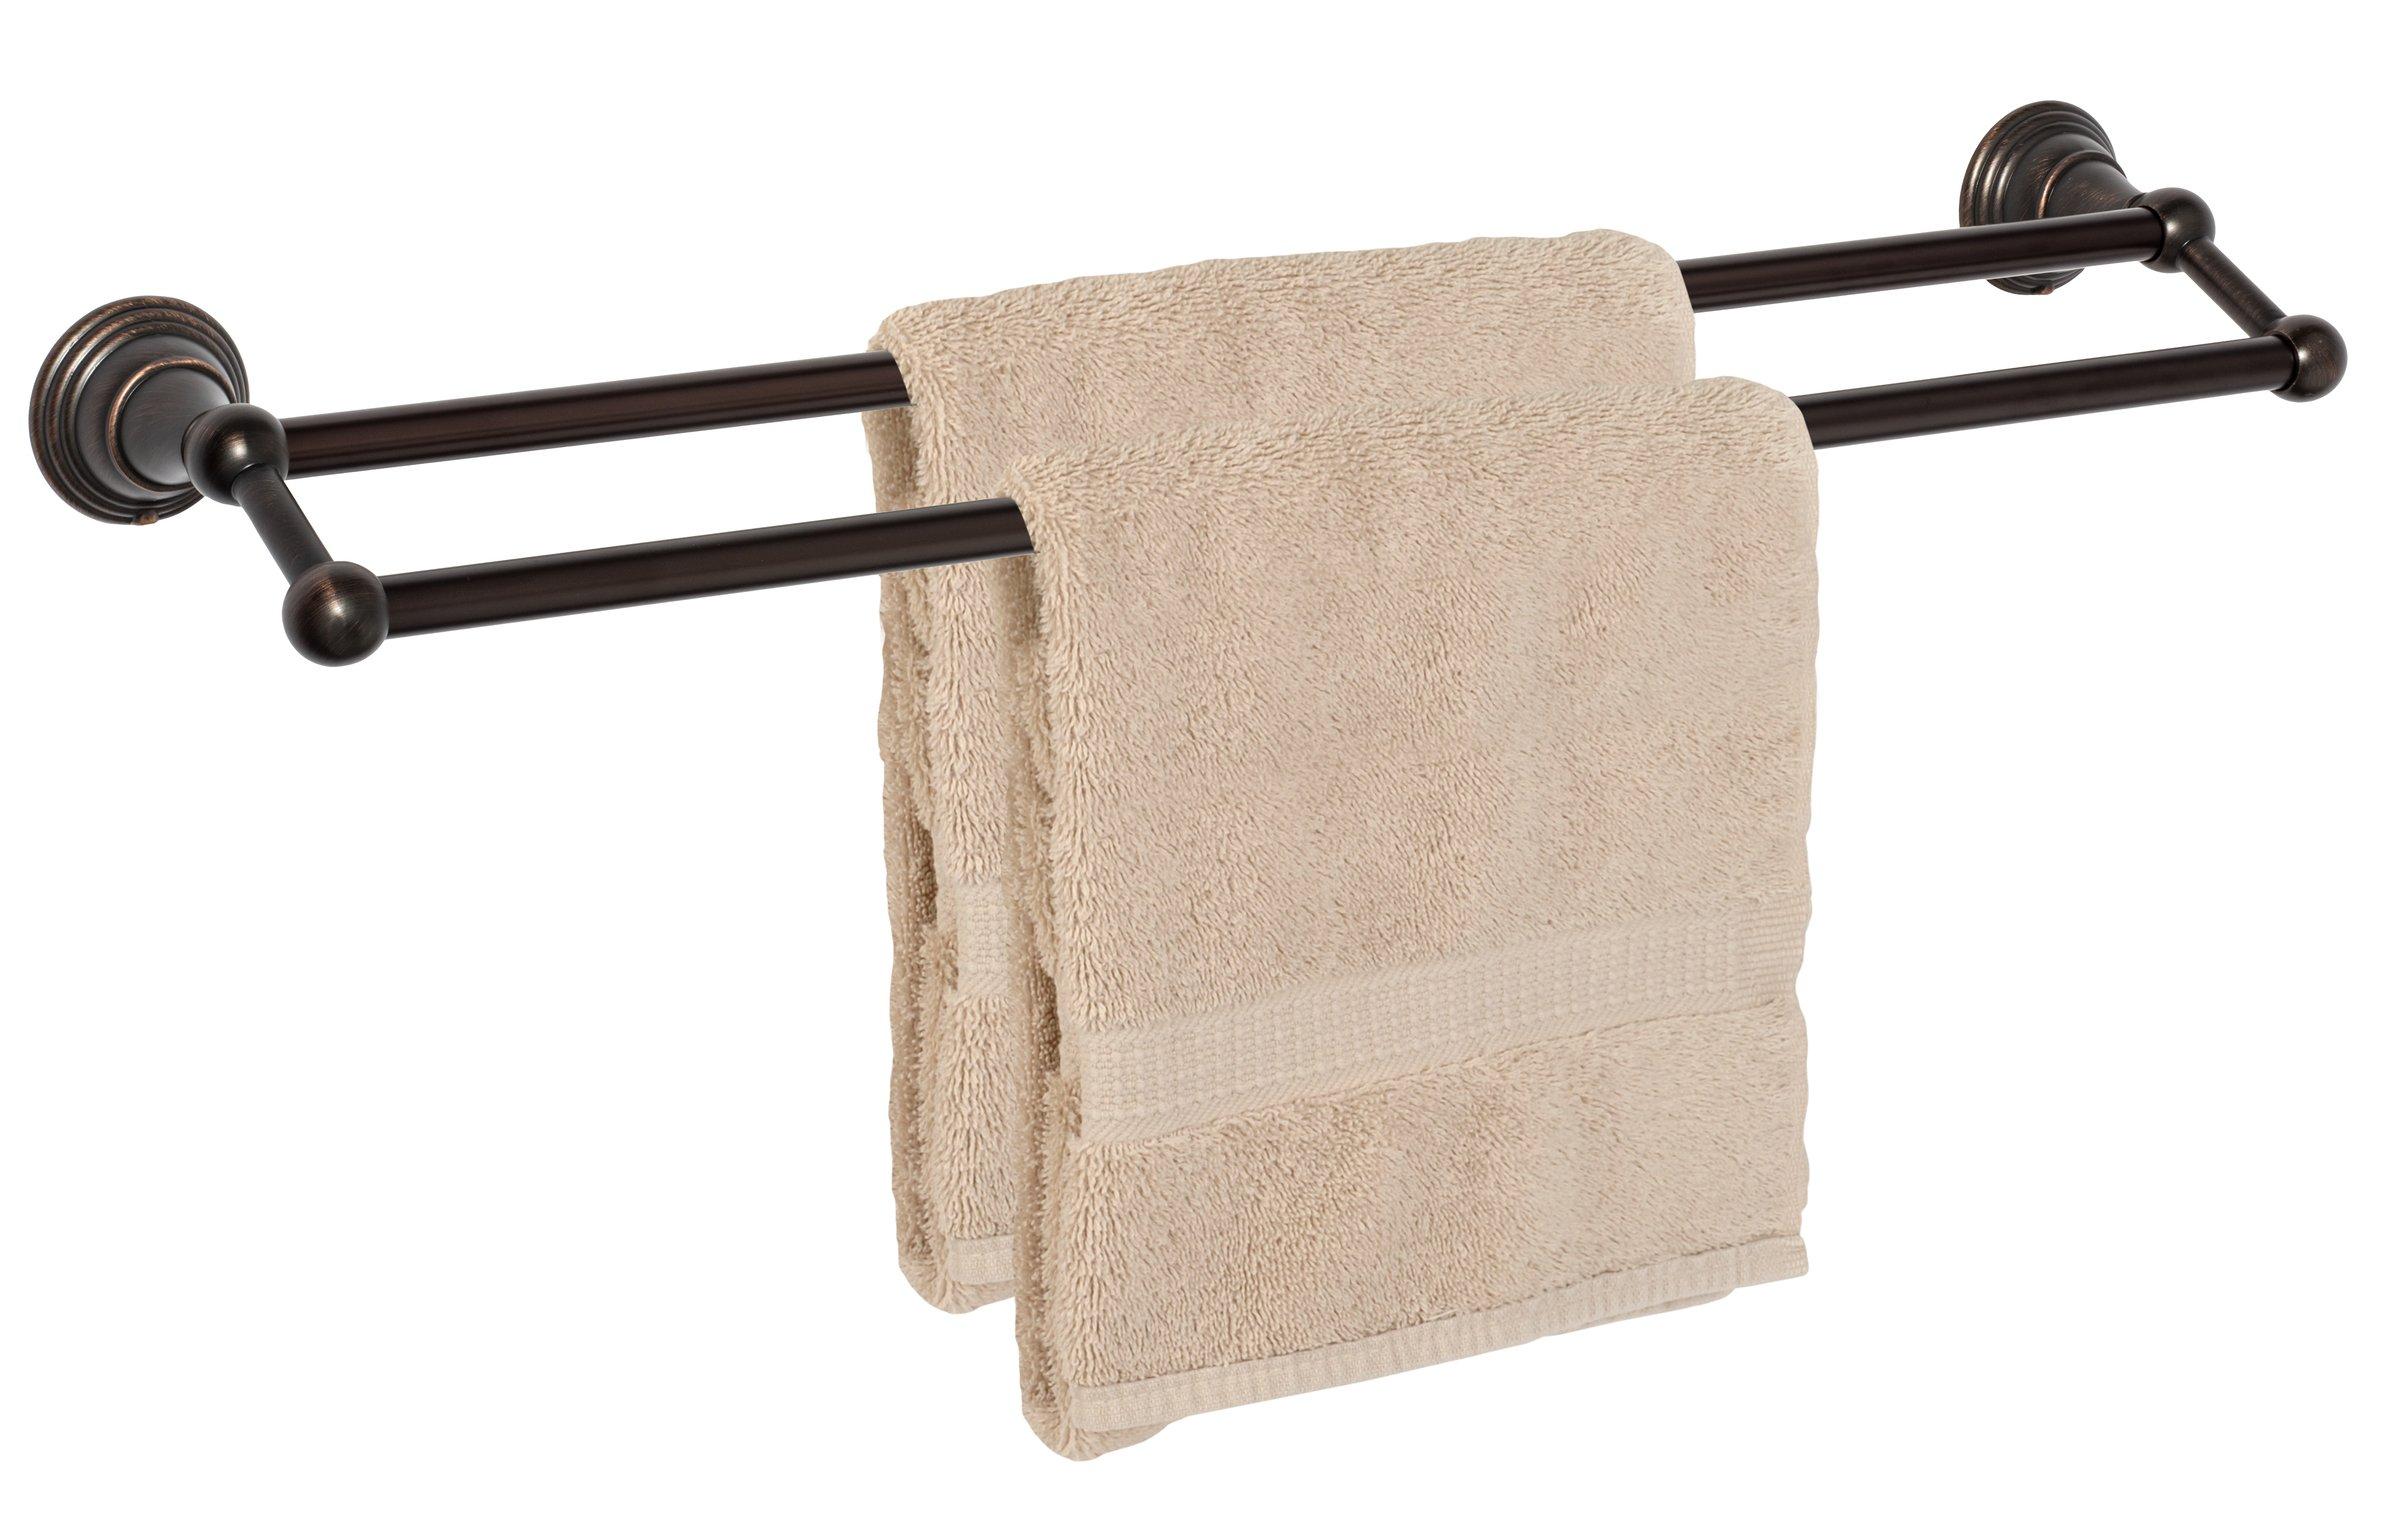 Dynasty Hardware 2216-ORB Muirfield 24'' Double Towel Bar Oil Rubbed Bronze